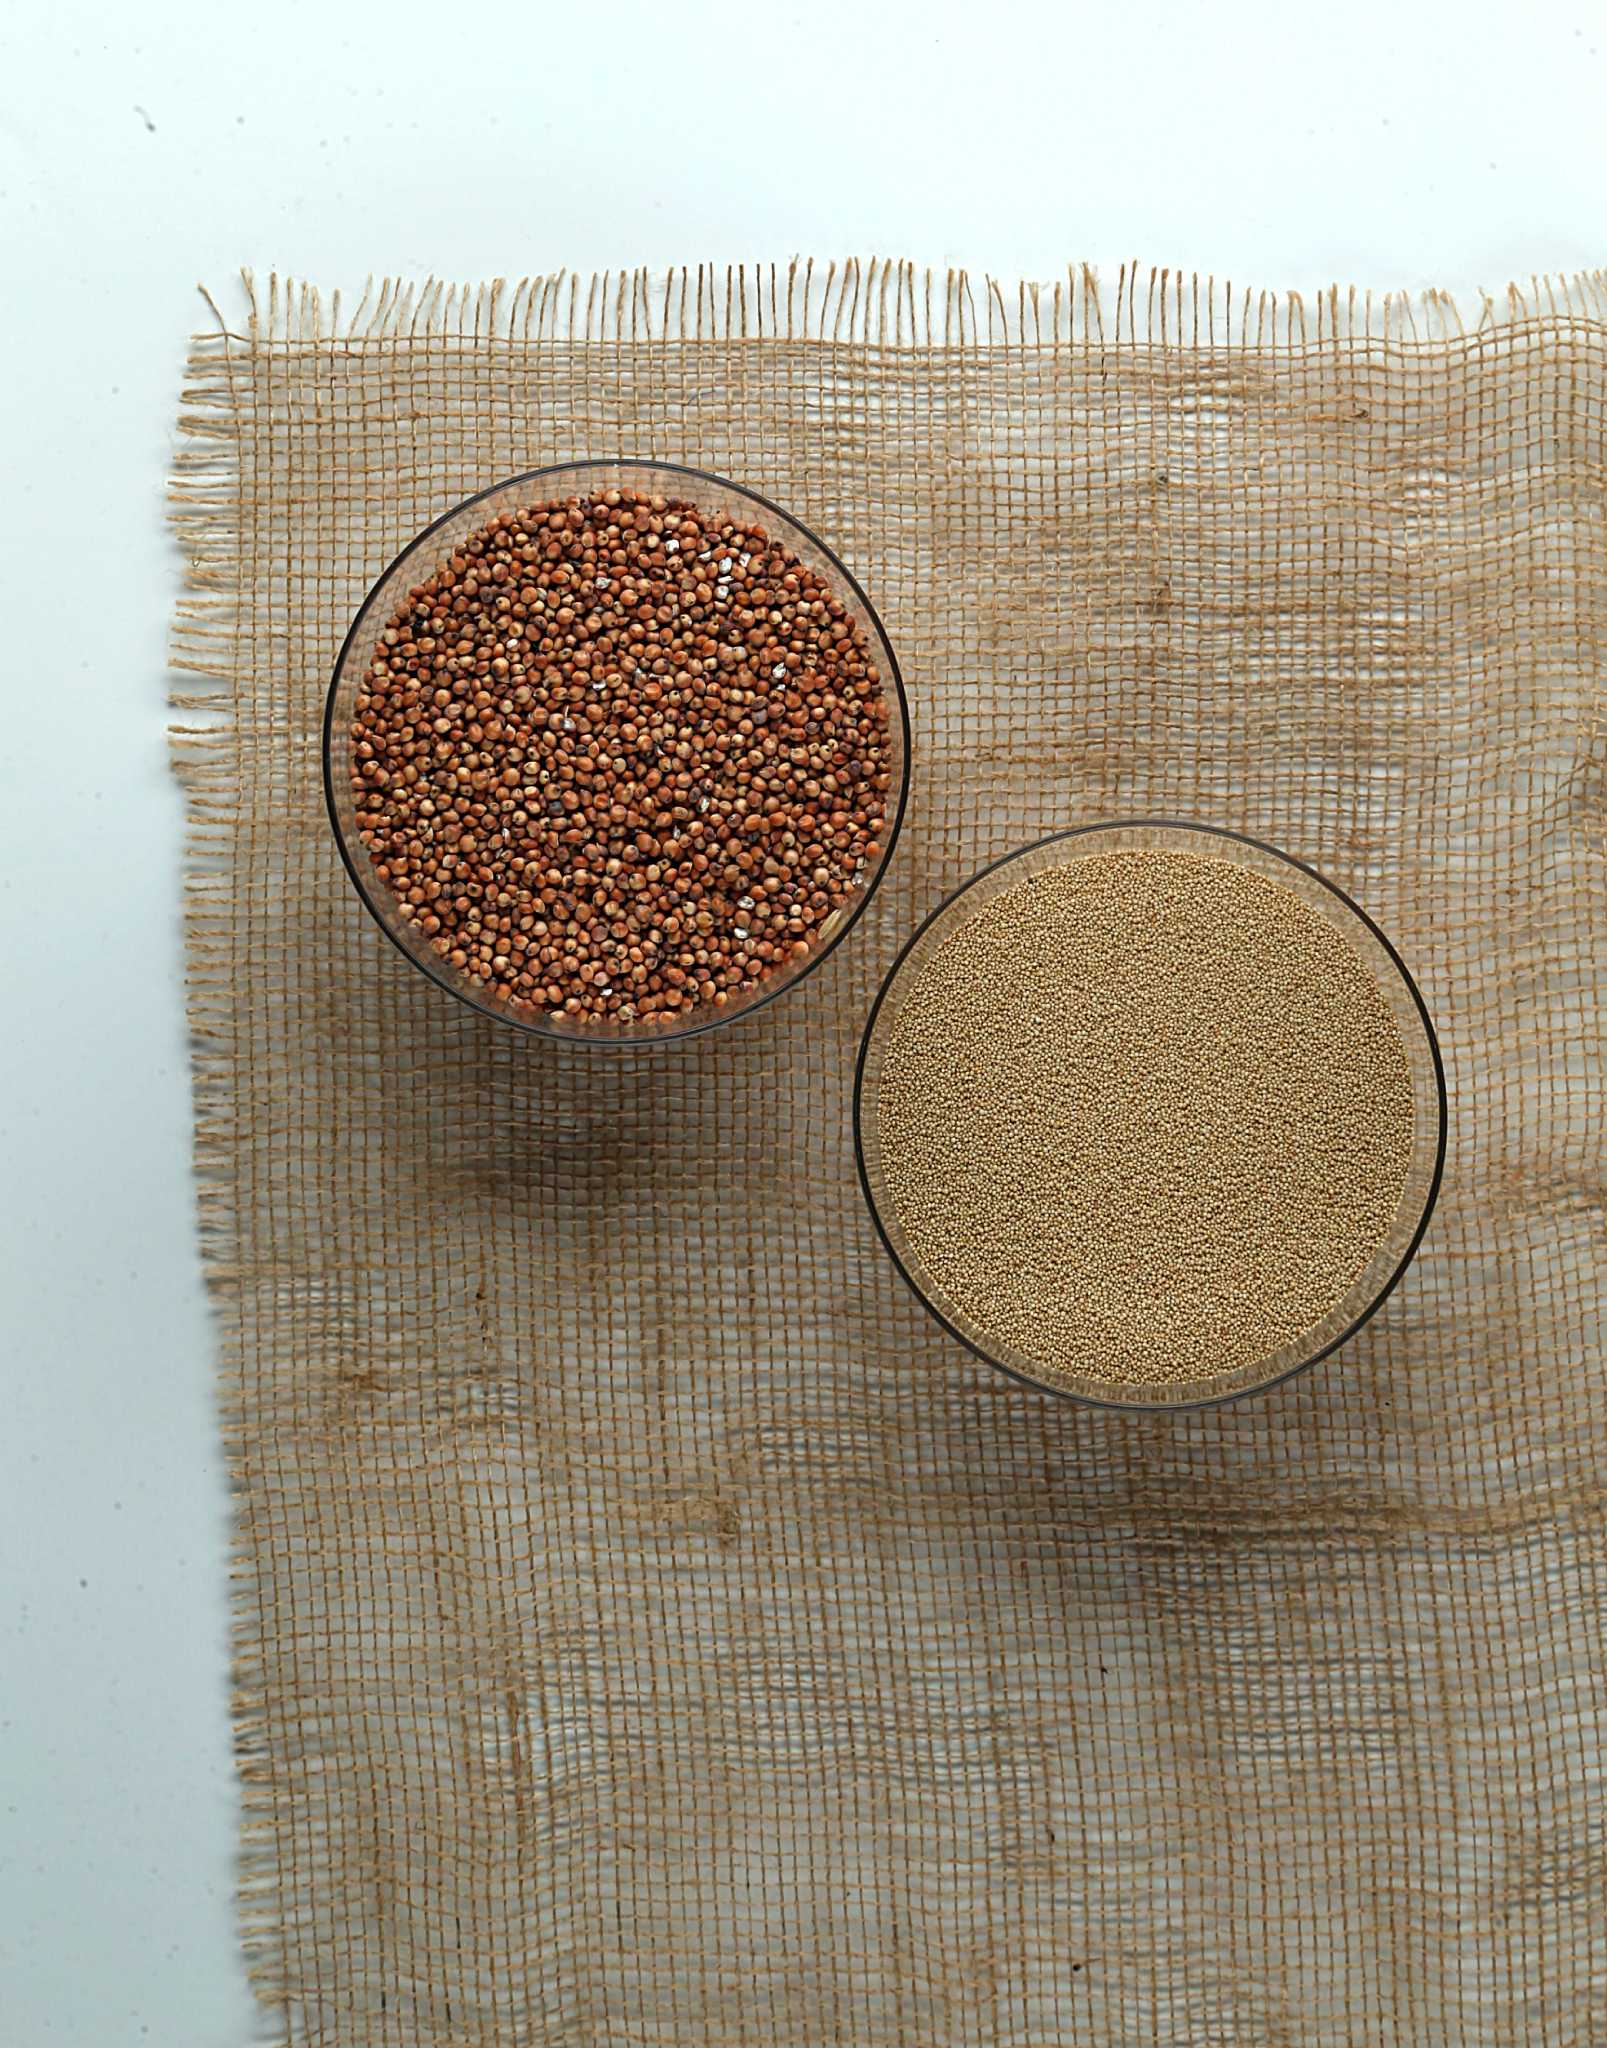 Harvest backyard grain crops to make tasty treats in the kitchen ...